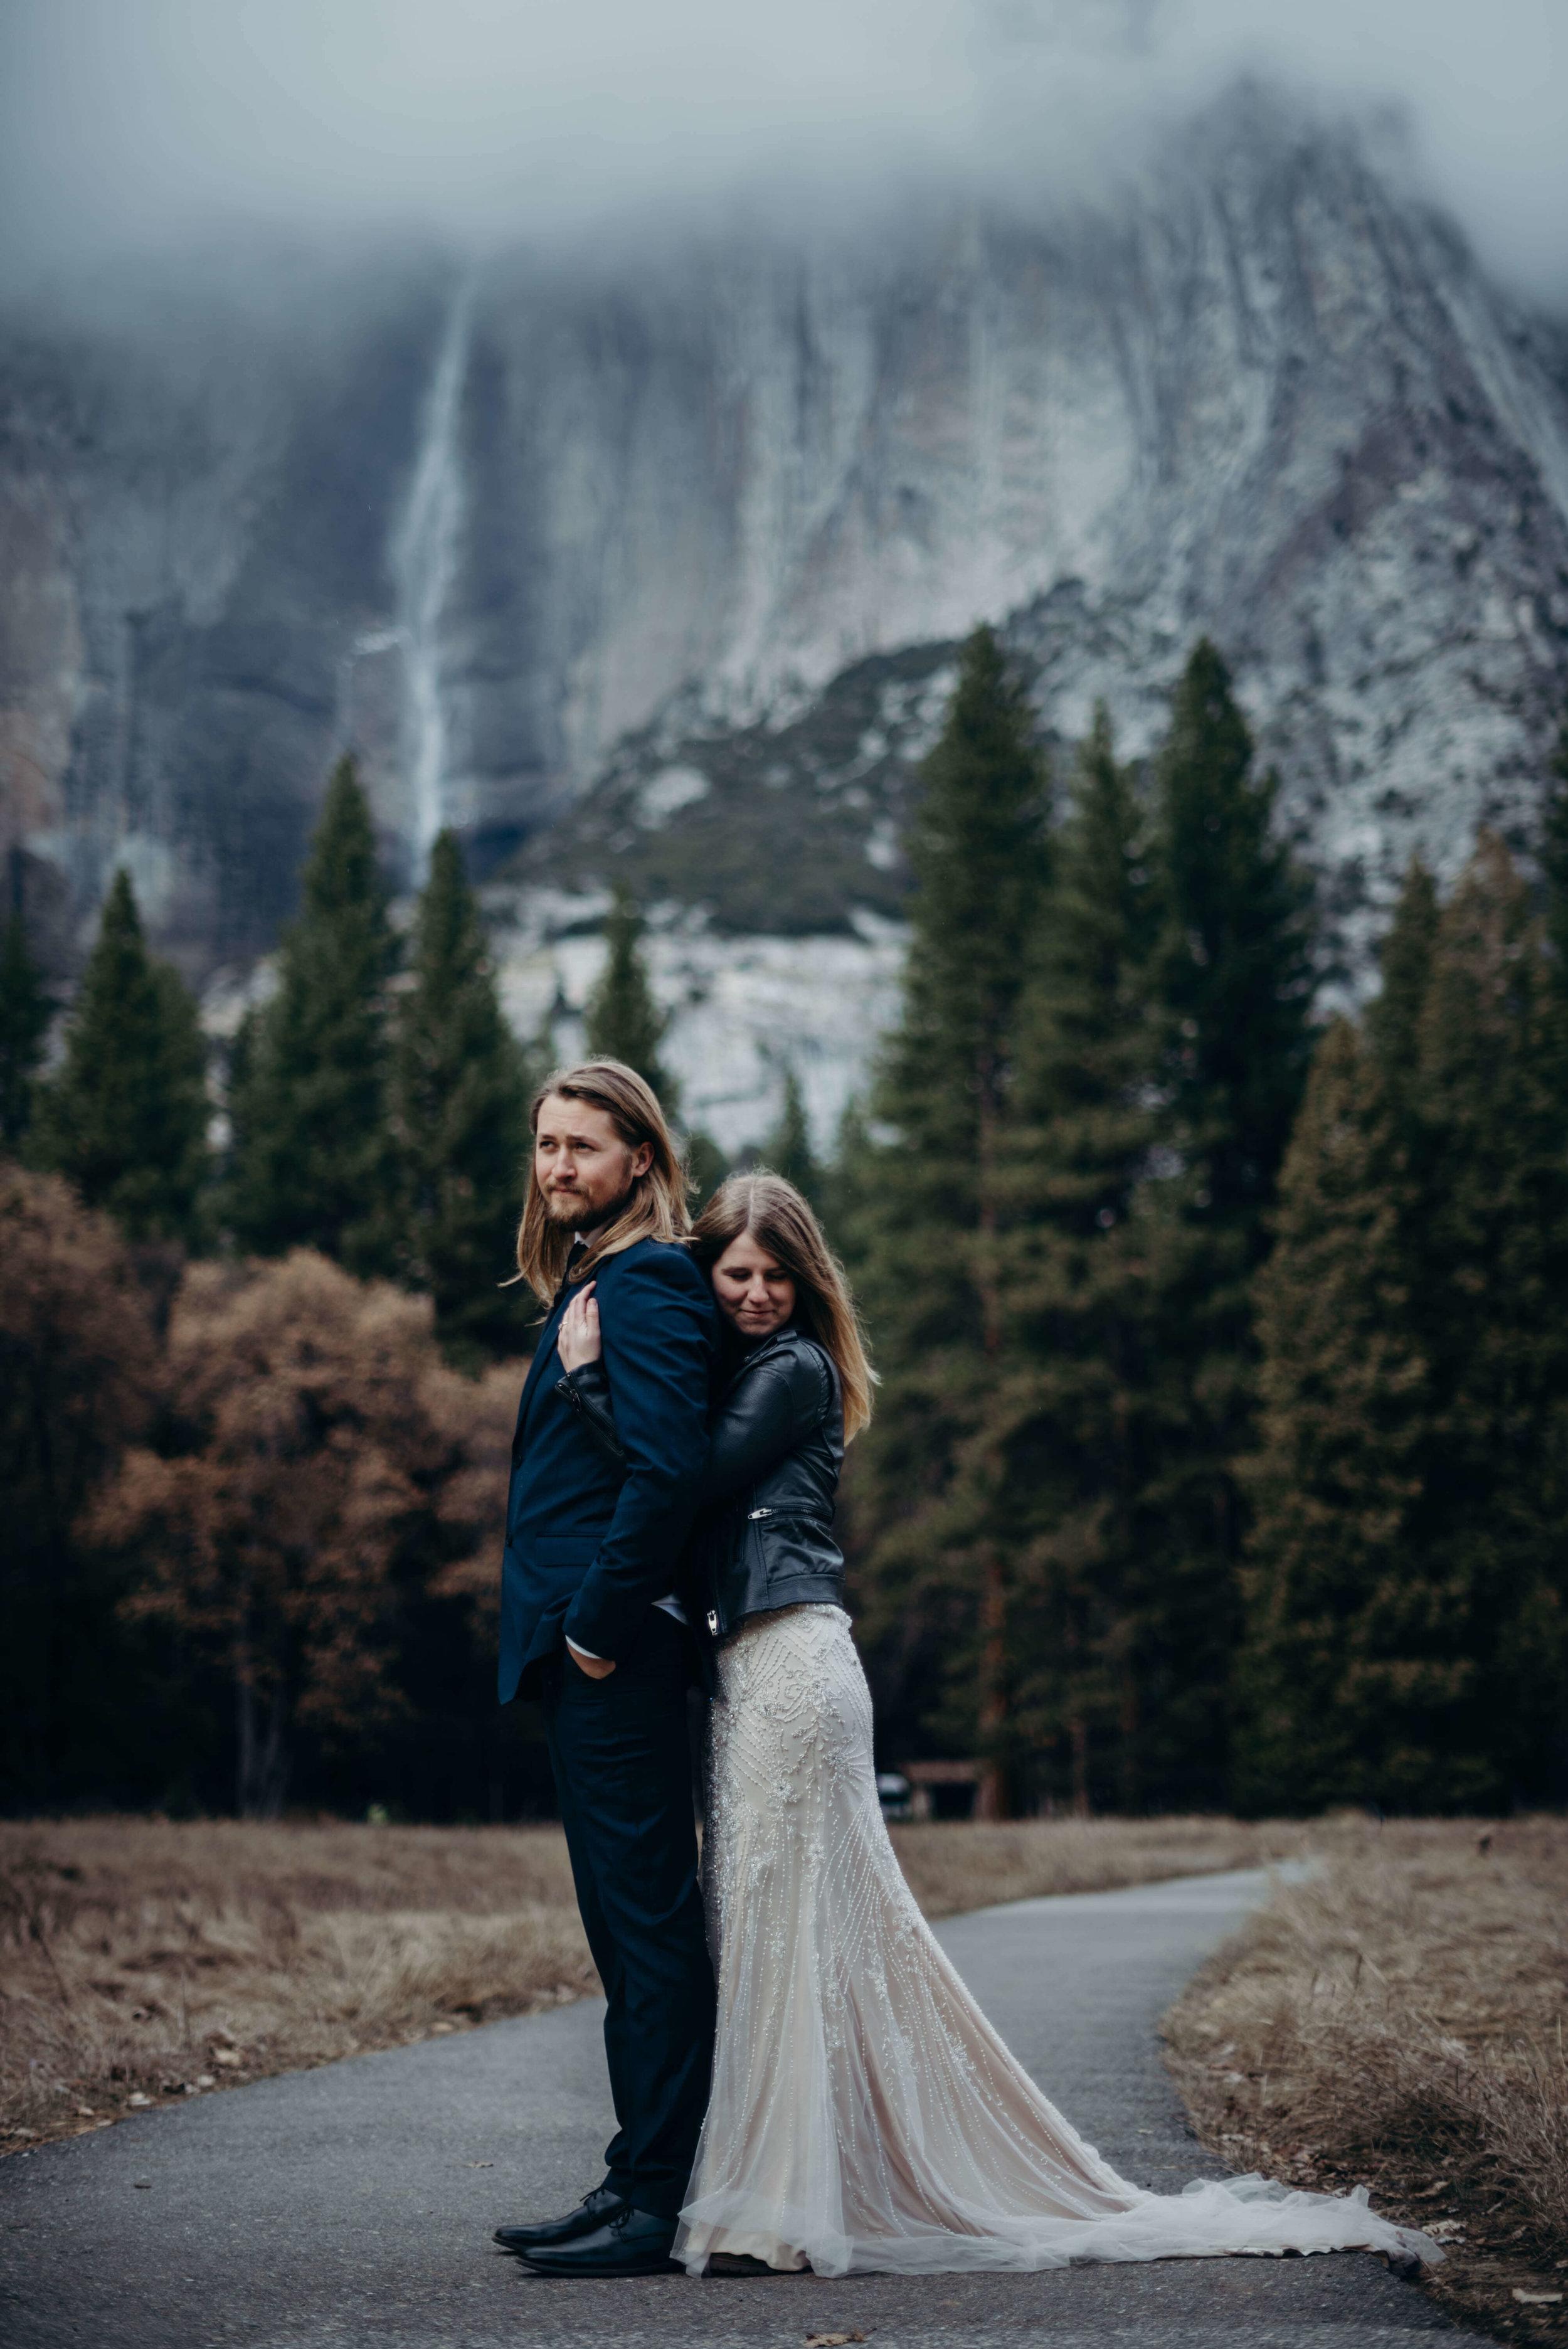 Adventure-Elopement-Yosemite-Valley-2.jpg